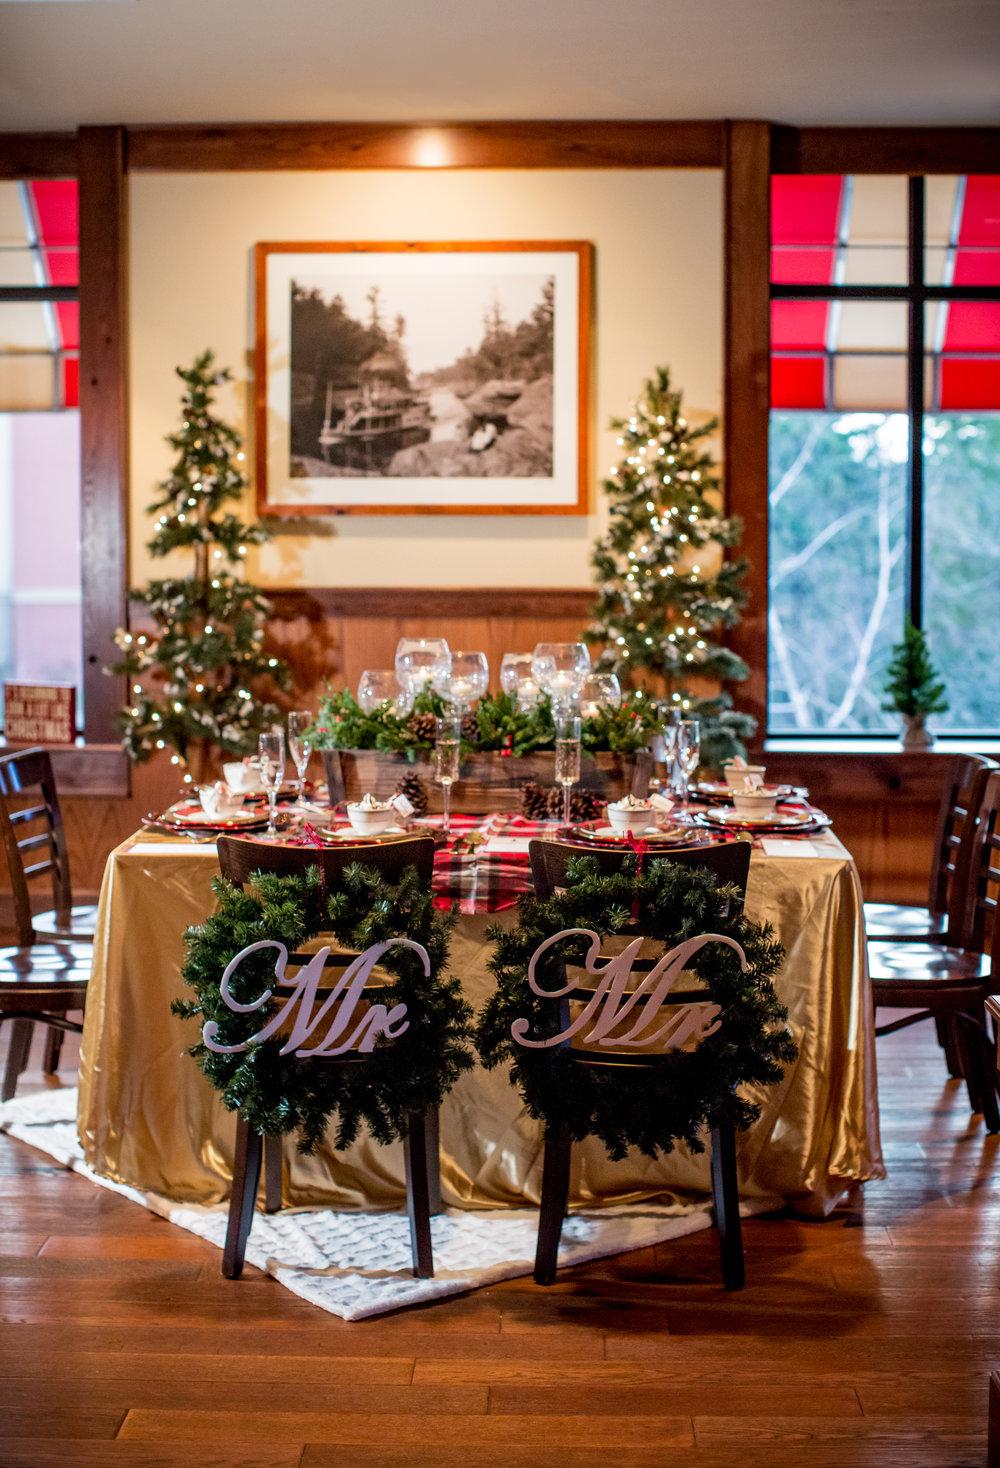 Chula Vista Christmas Wedding by Peer Canvas Photography & Films - 0071.jpg